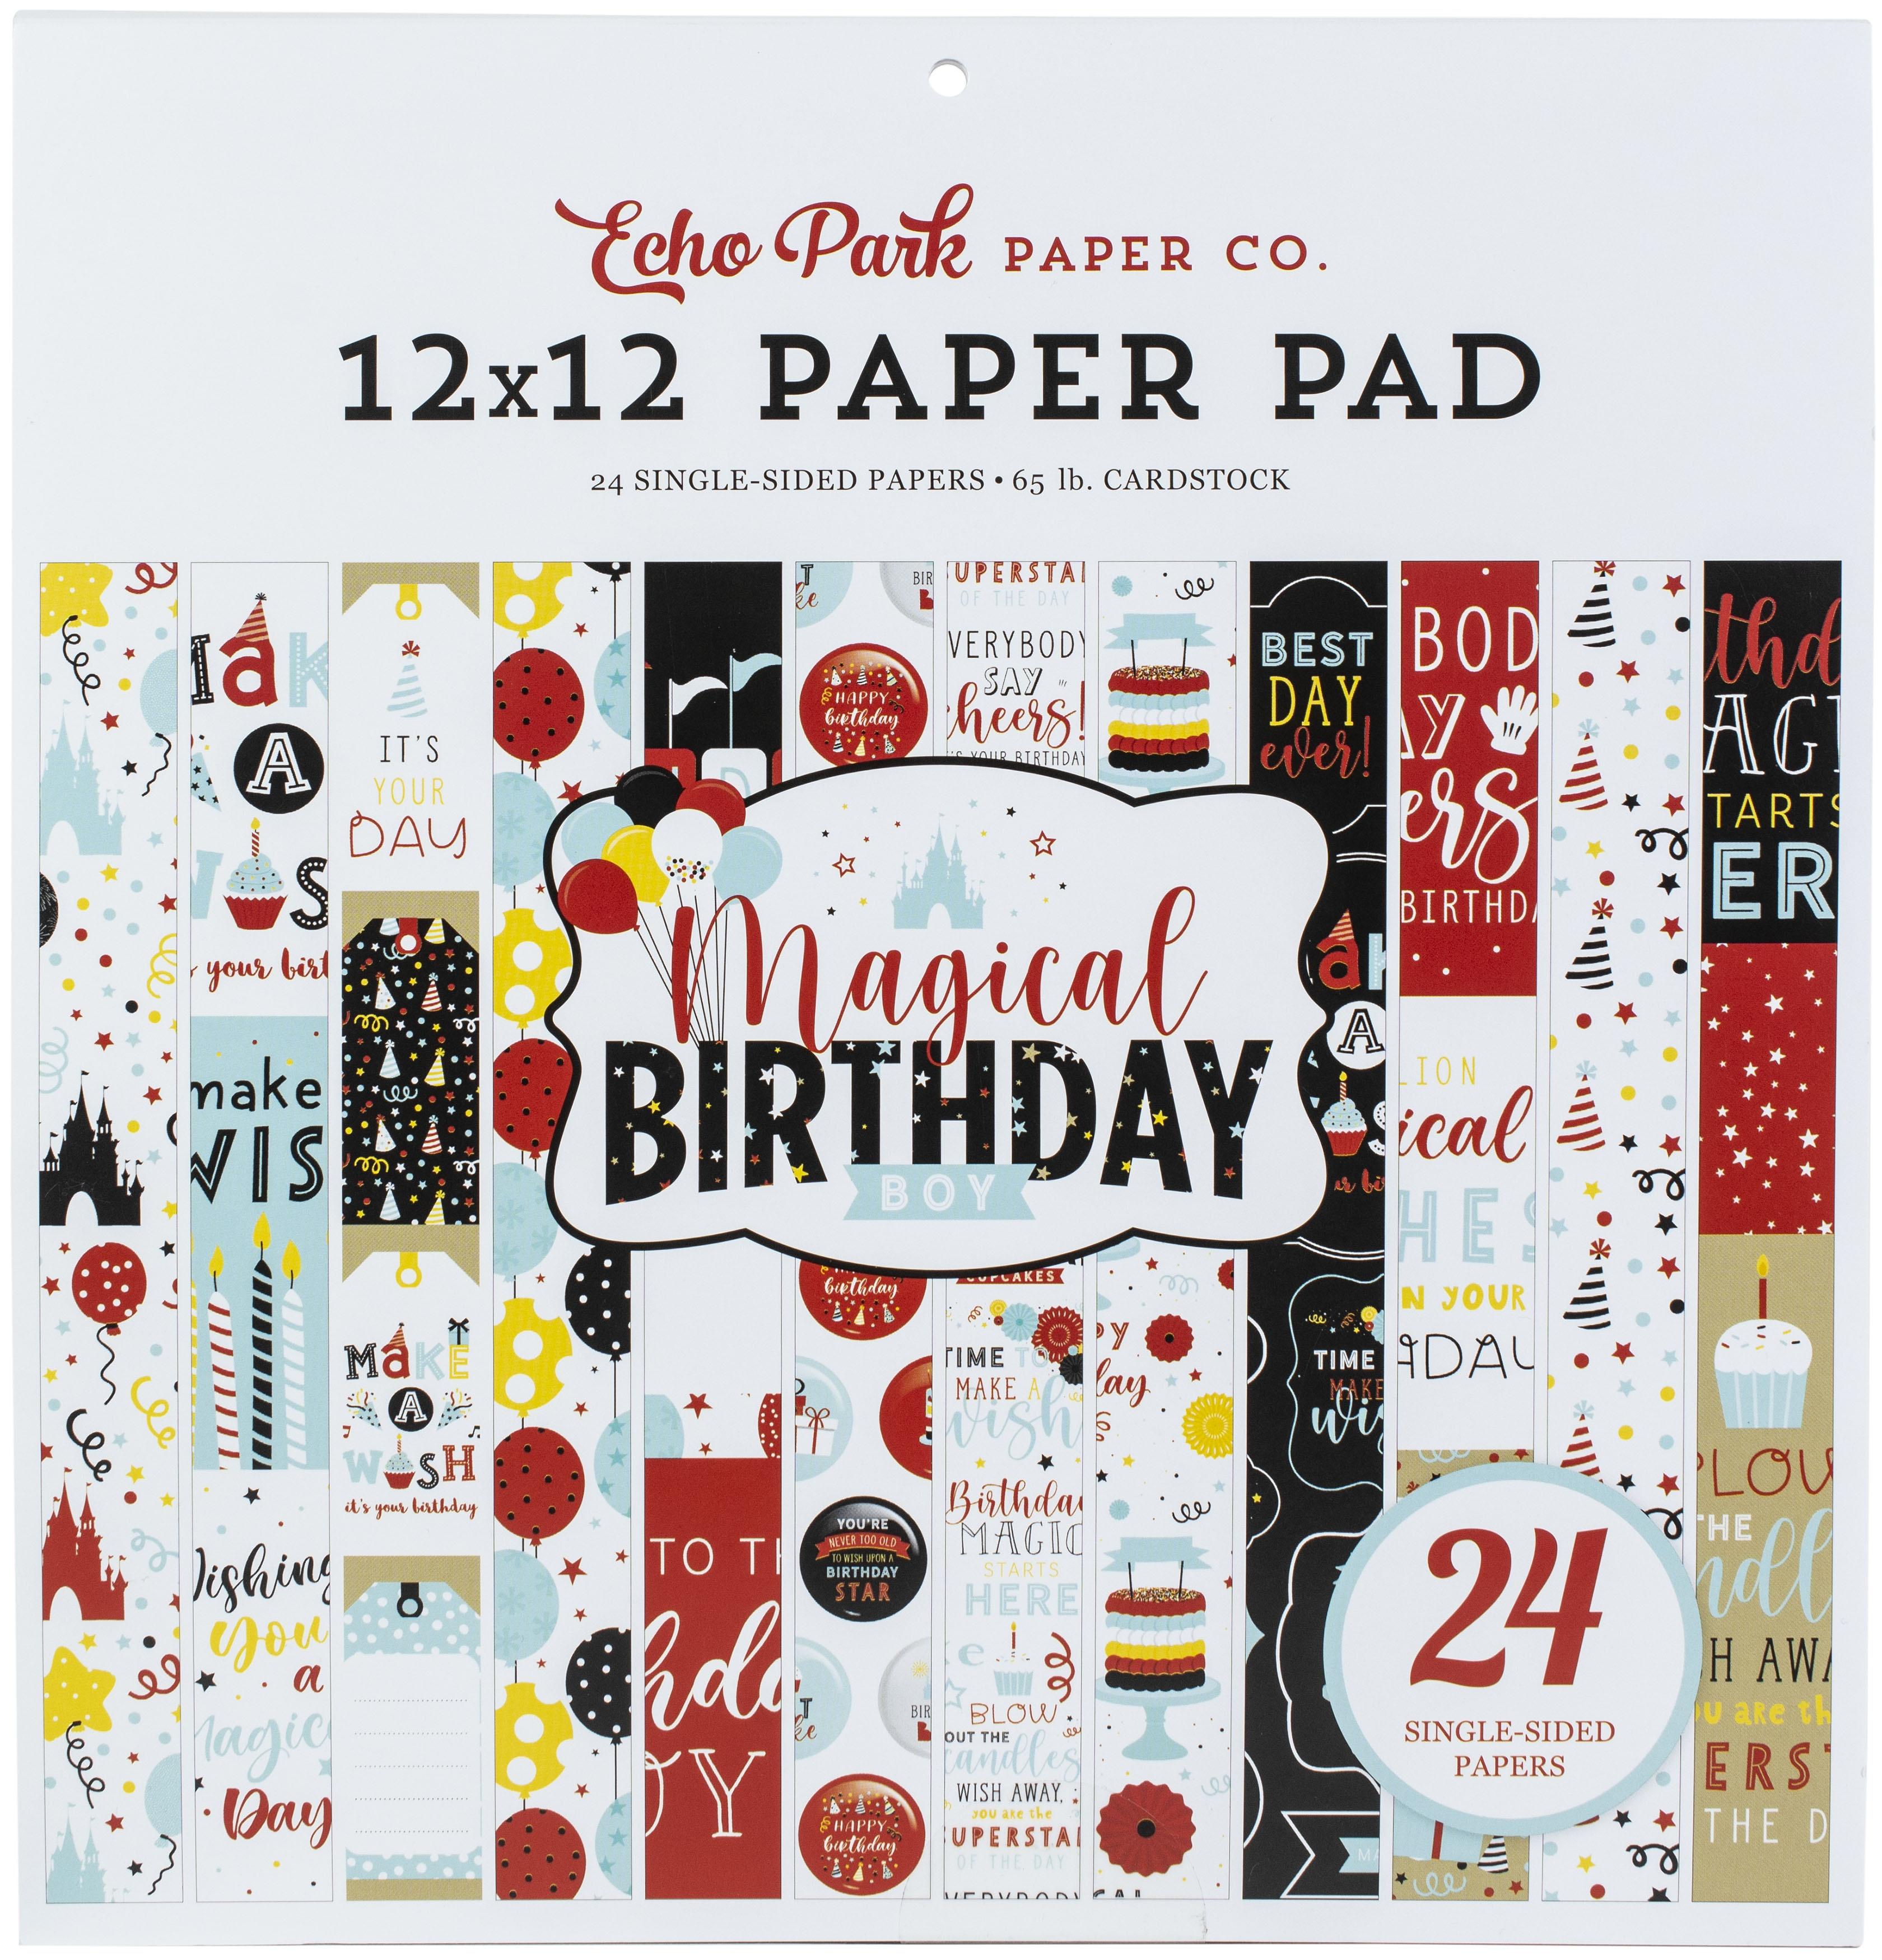 Magical Birthday Boy Single-Sided Paper Pad 24/Pkg